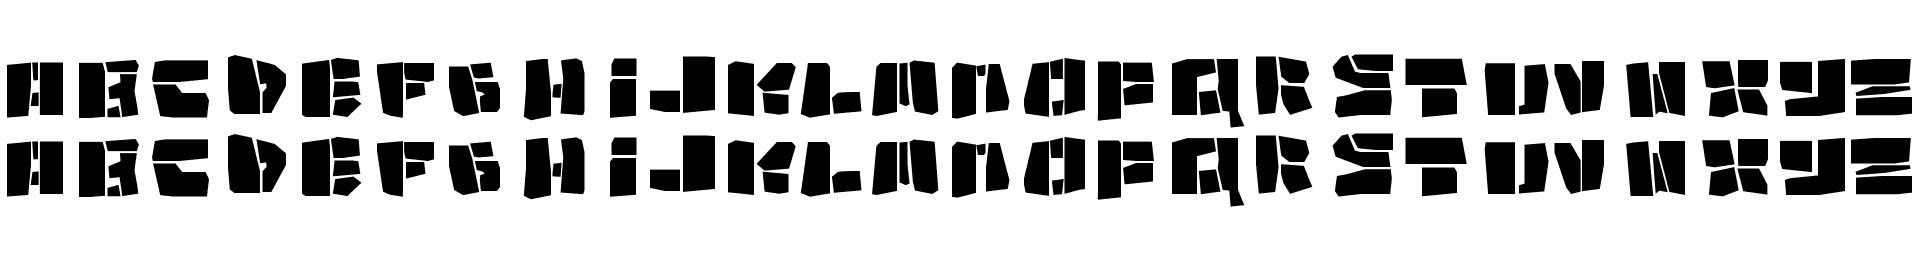 Copycut